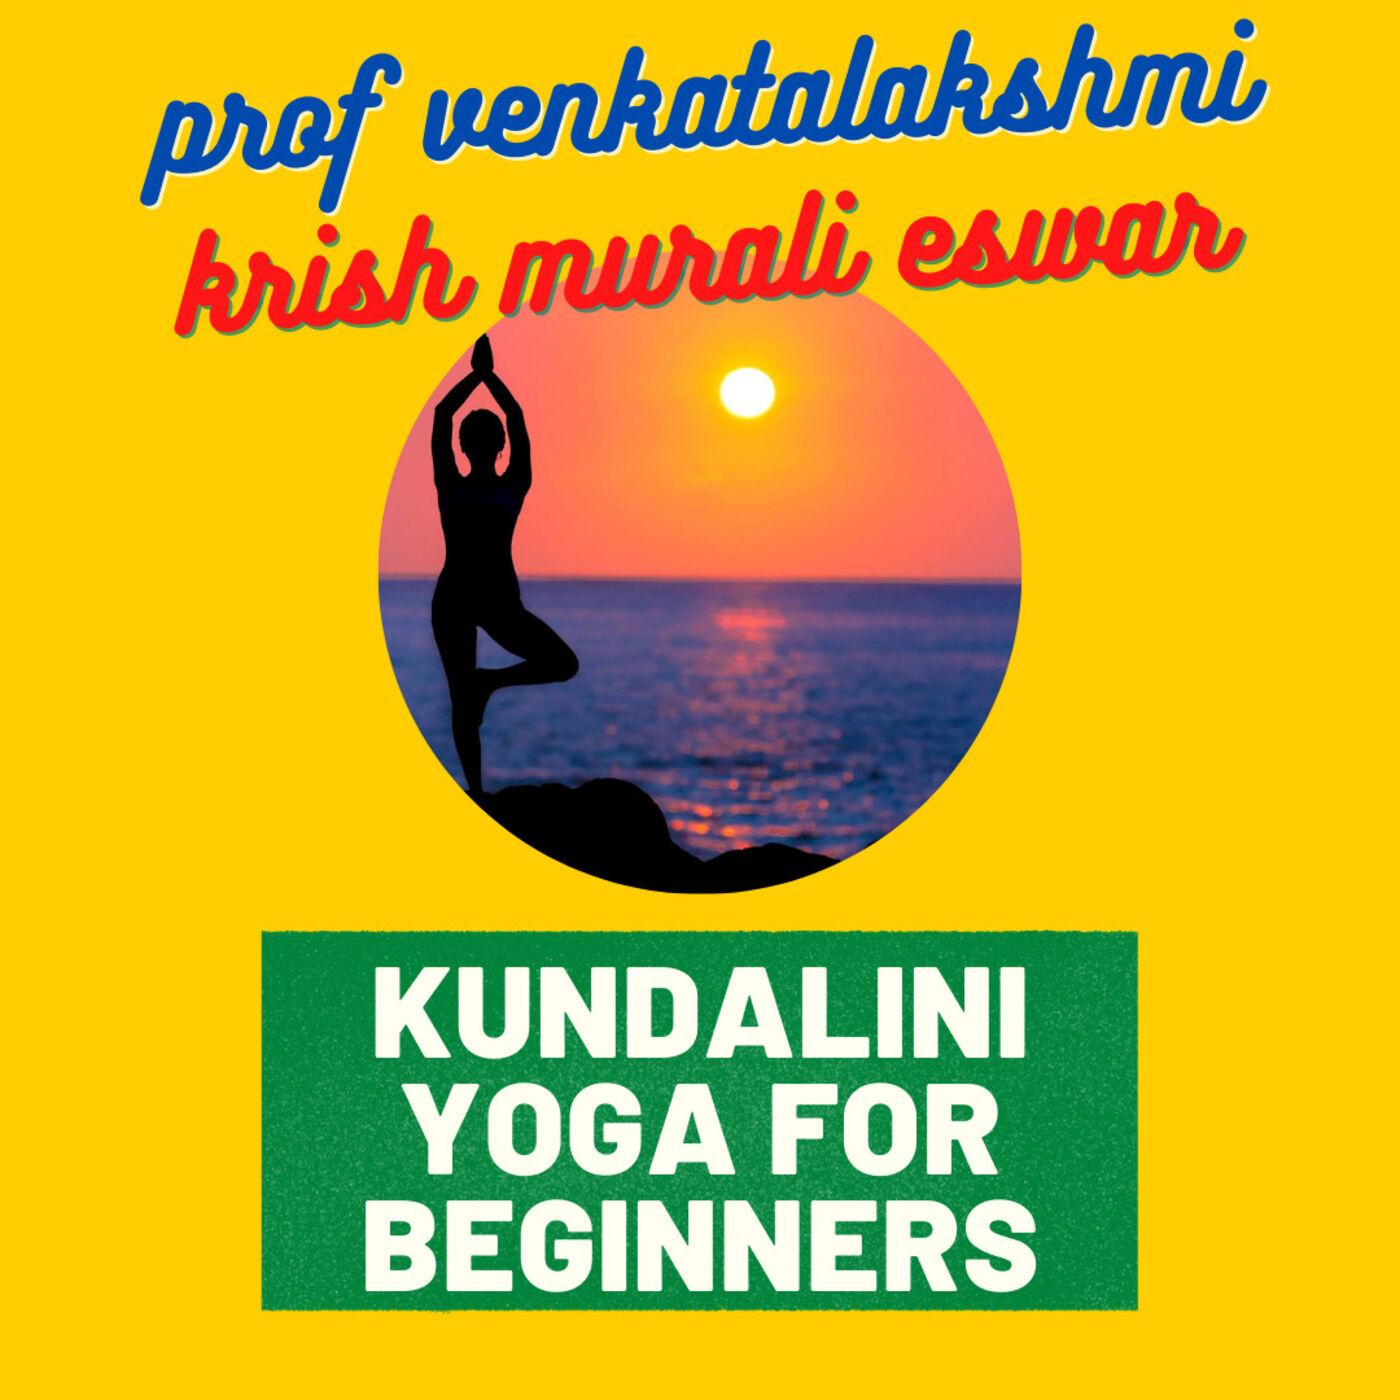 107 Kundalini Awakening to Ajna Chakra - Discussion with Prof Venkatalakshmi and Krish Murali Eswar